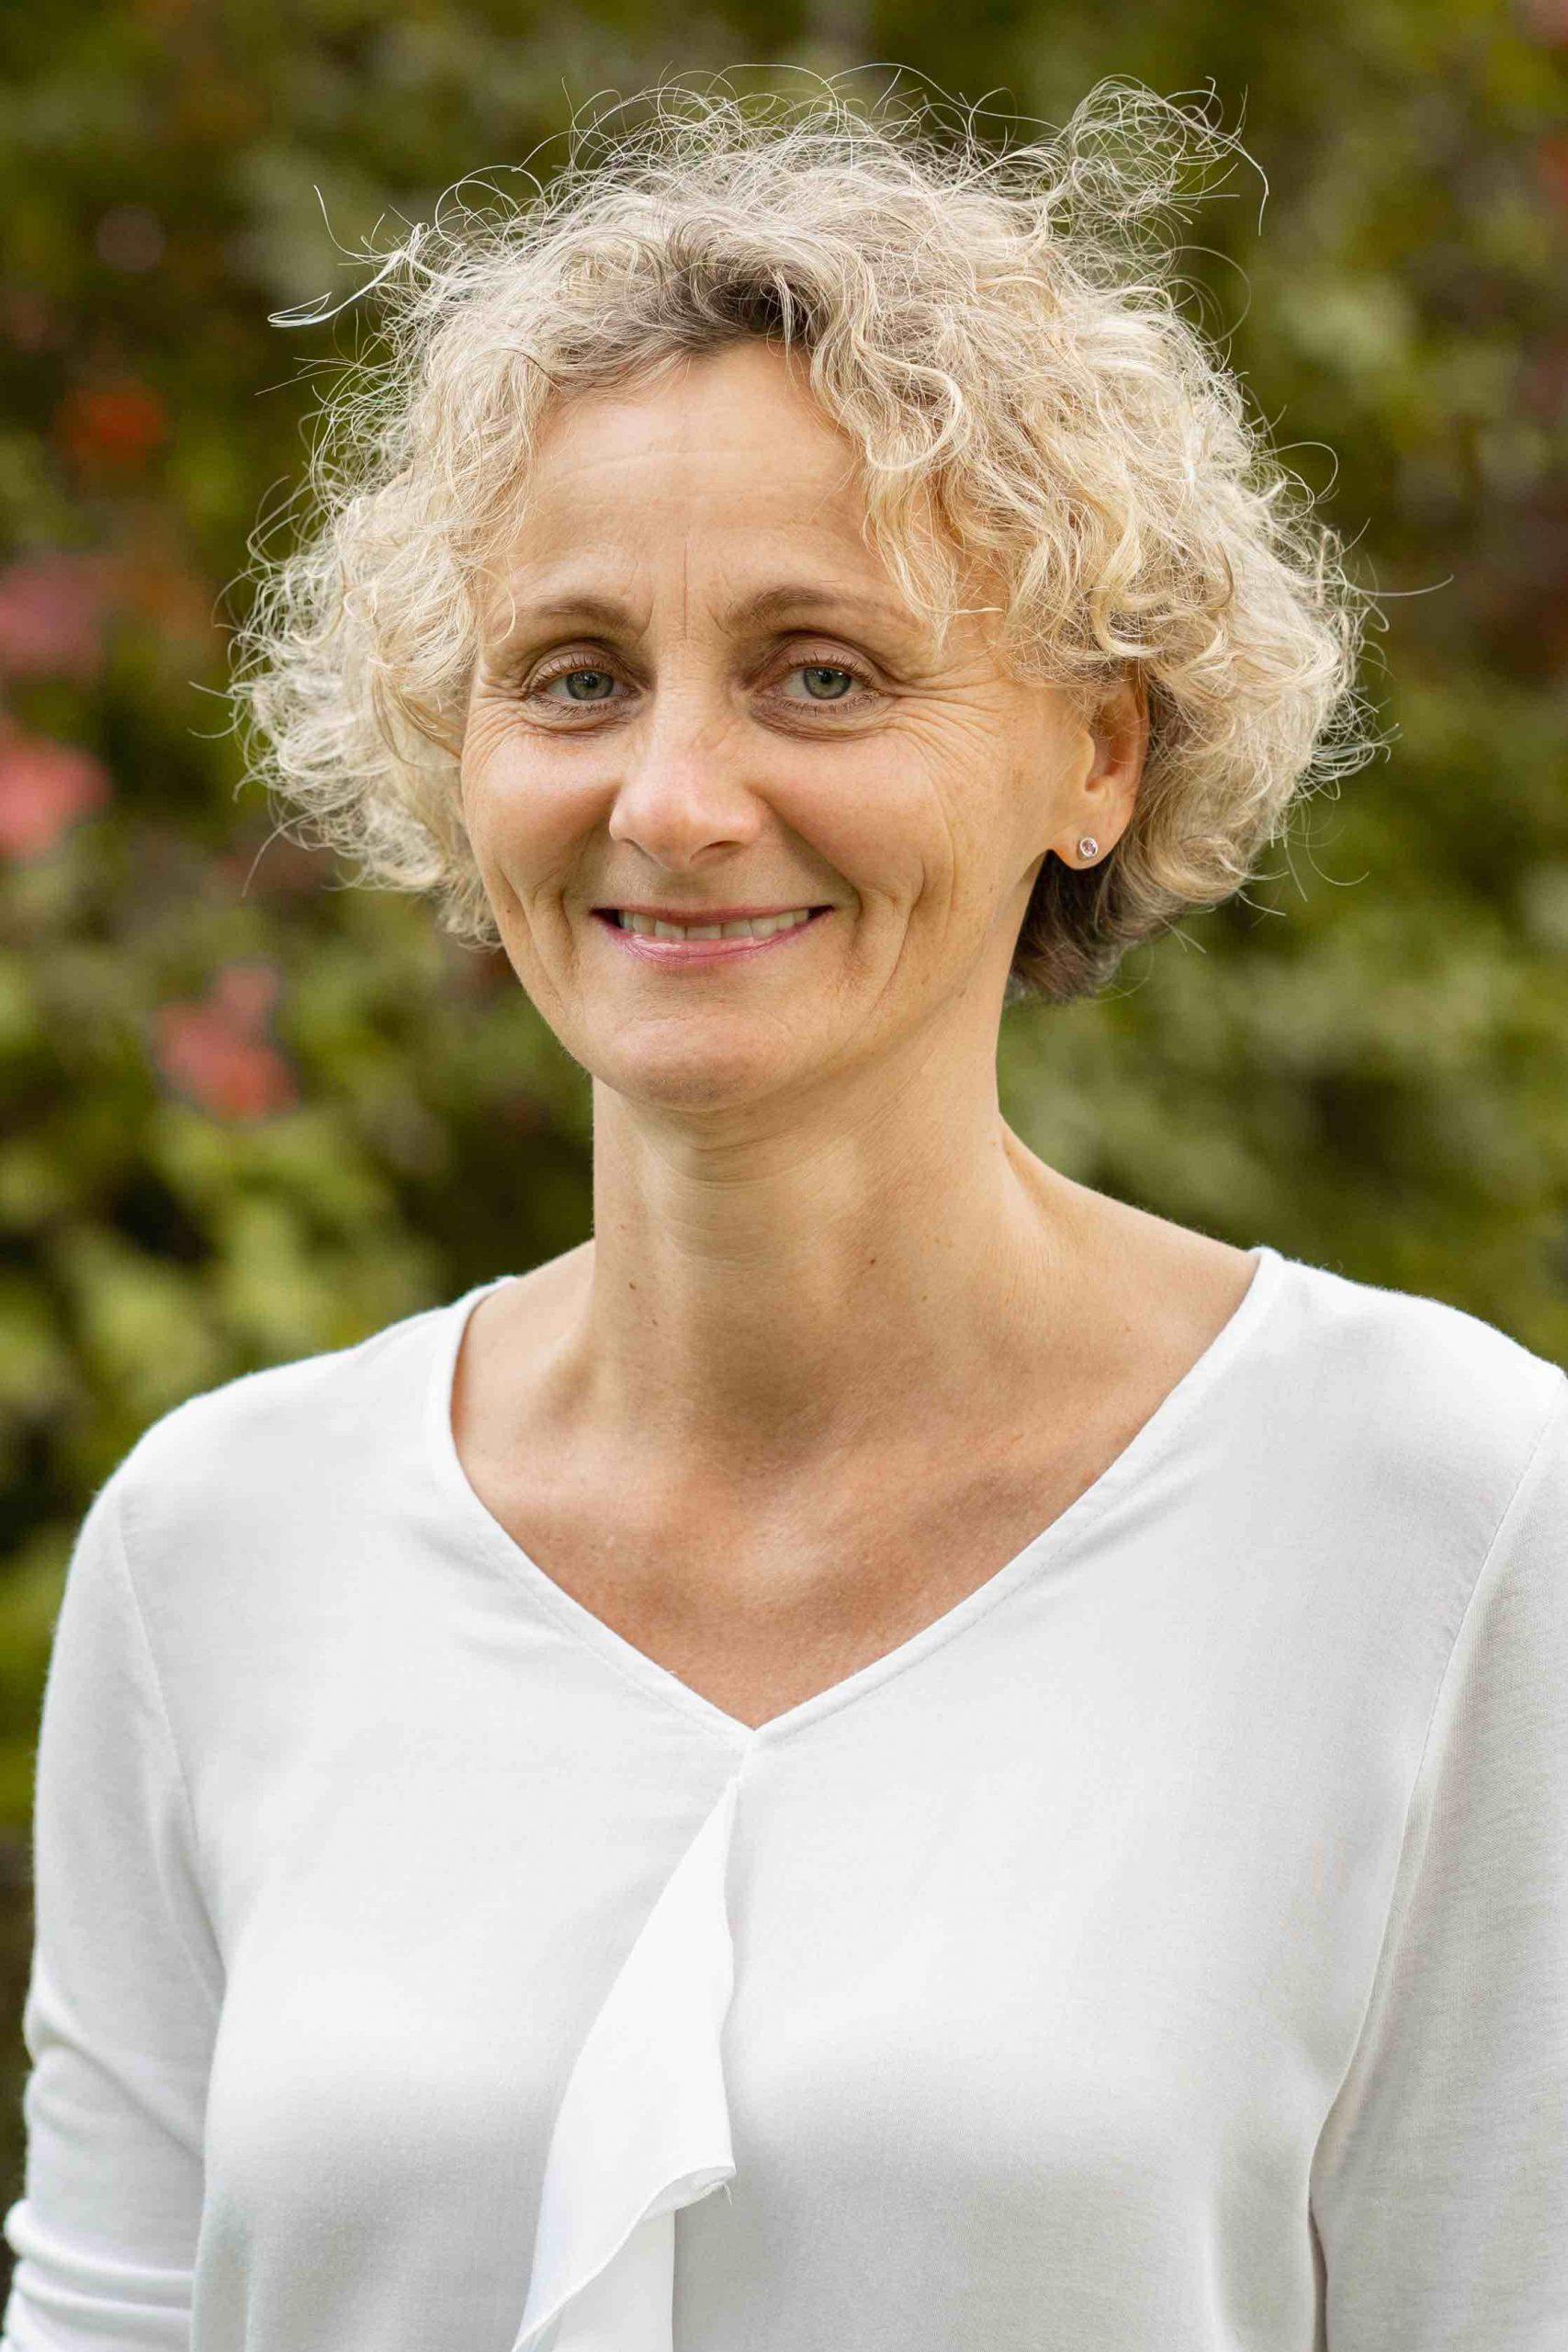 claudia Rötzer